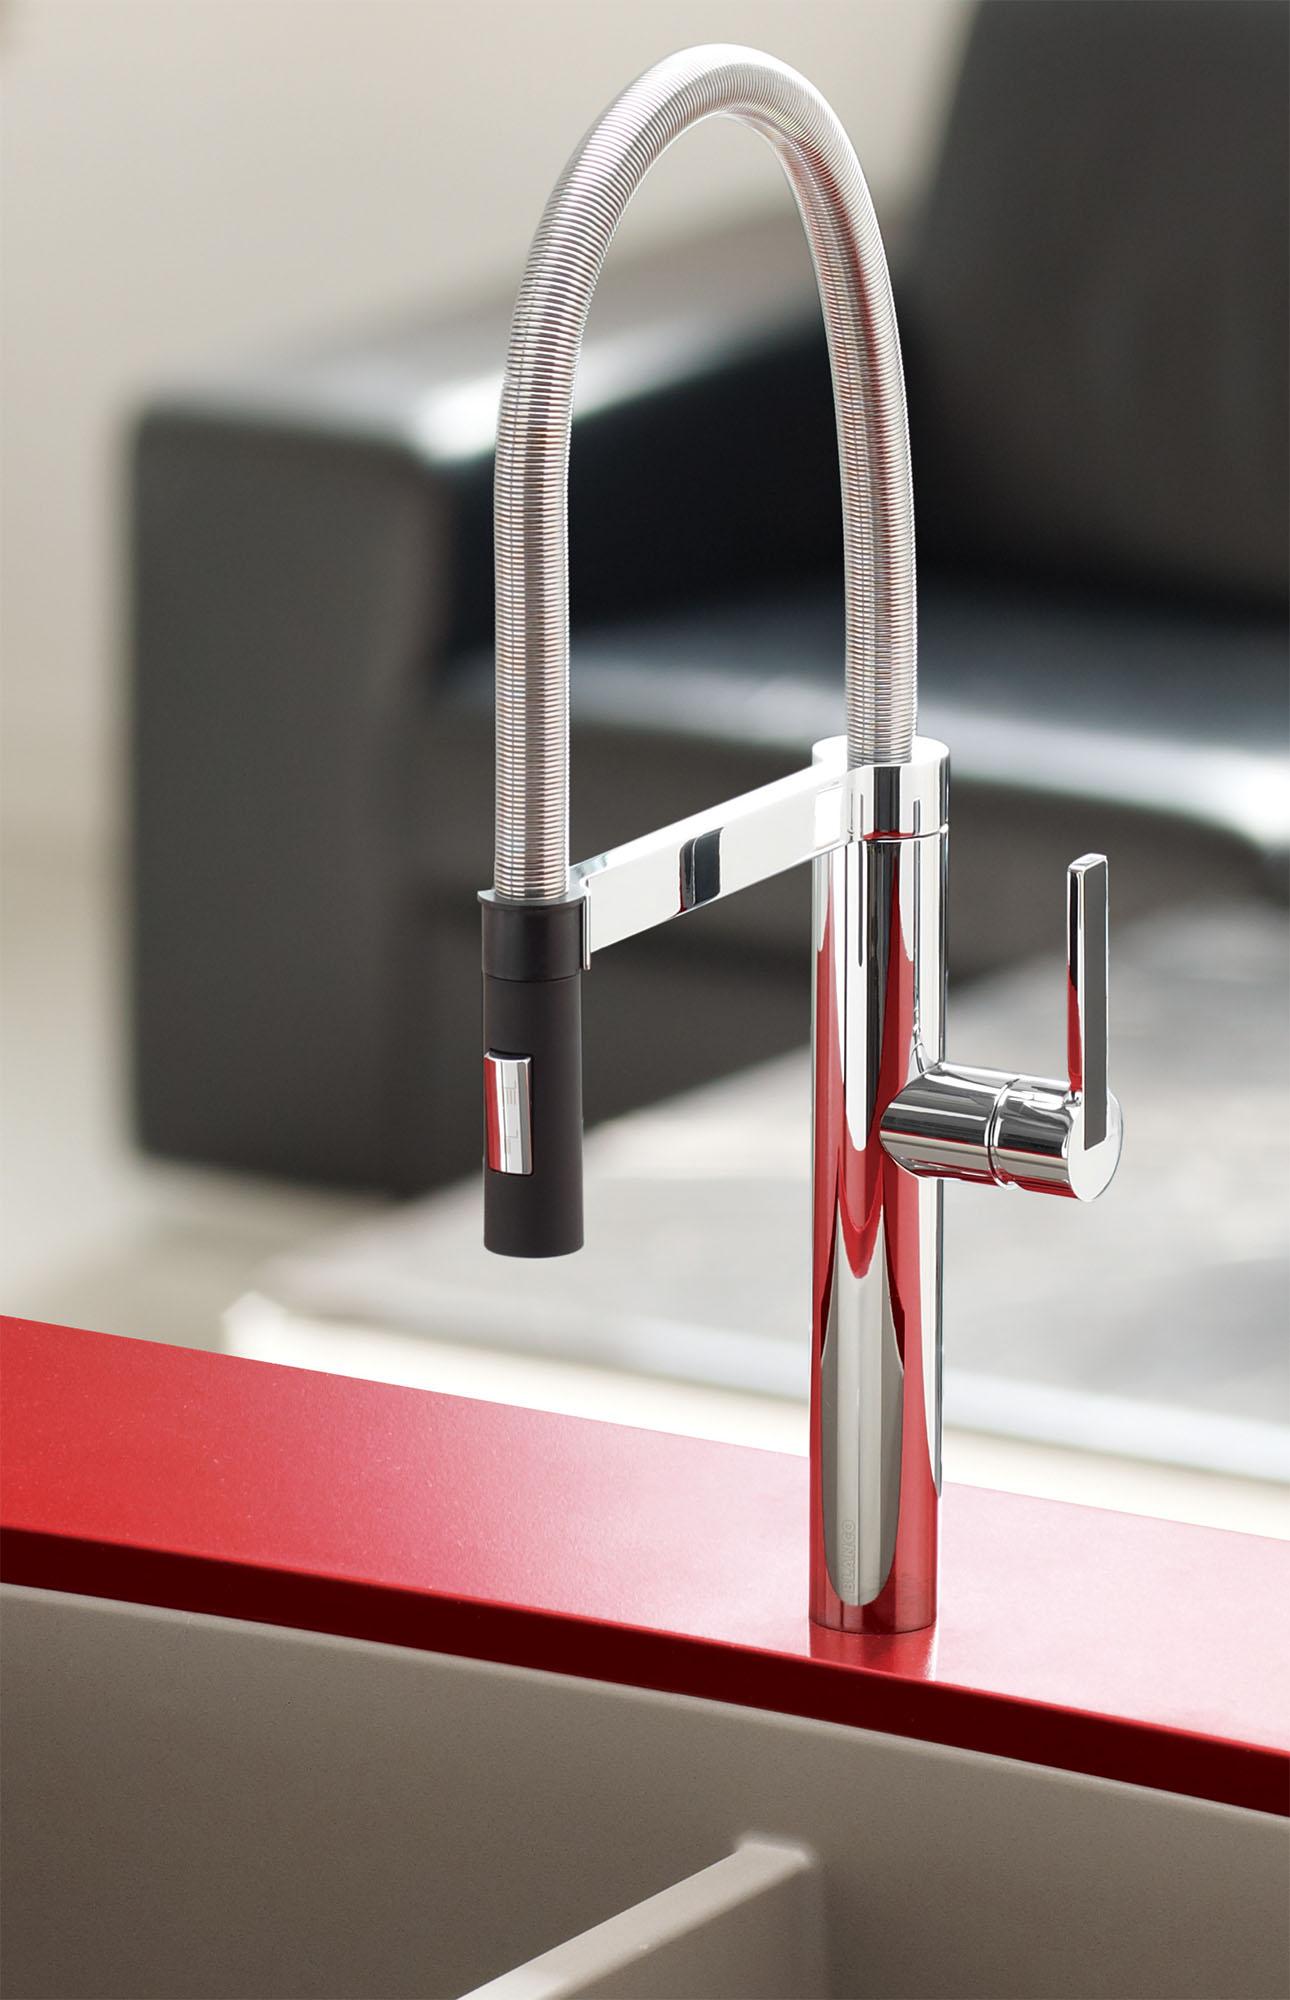 BLANCO CANADA INC. - BLANCO faucet wins international award